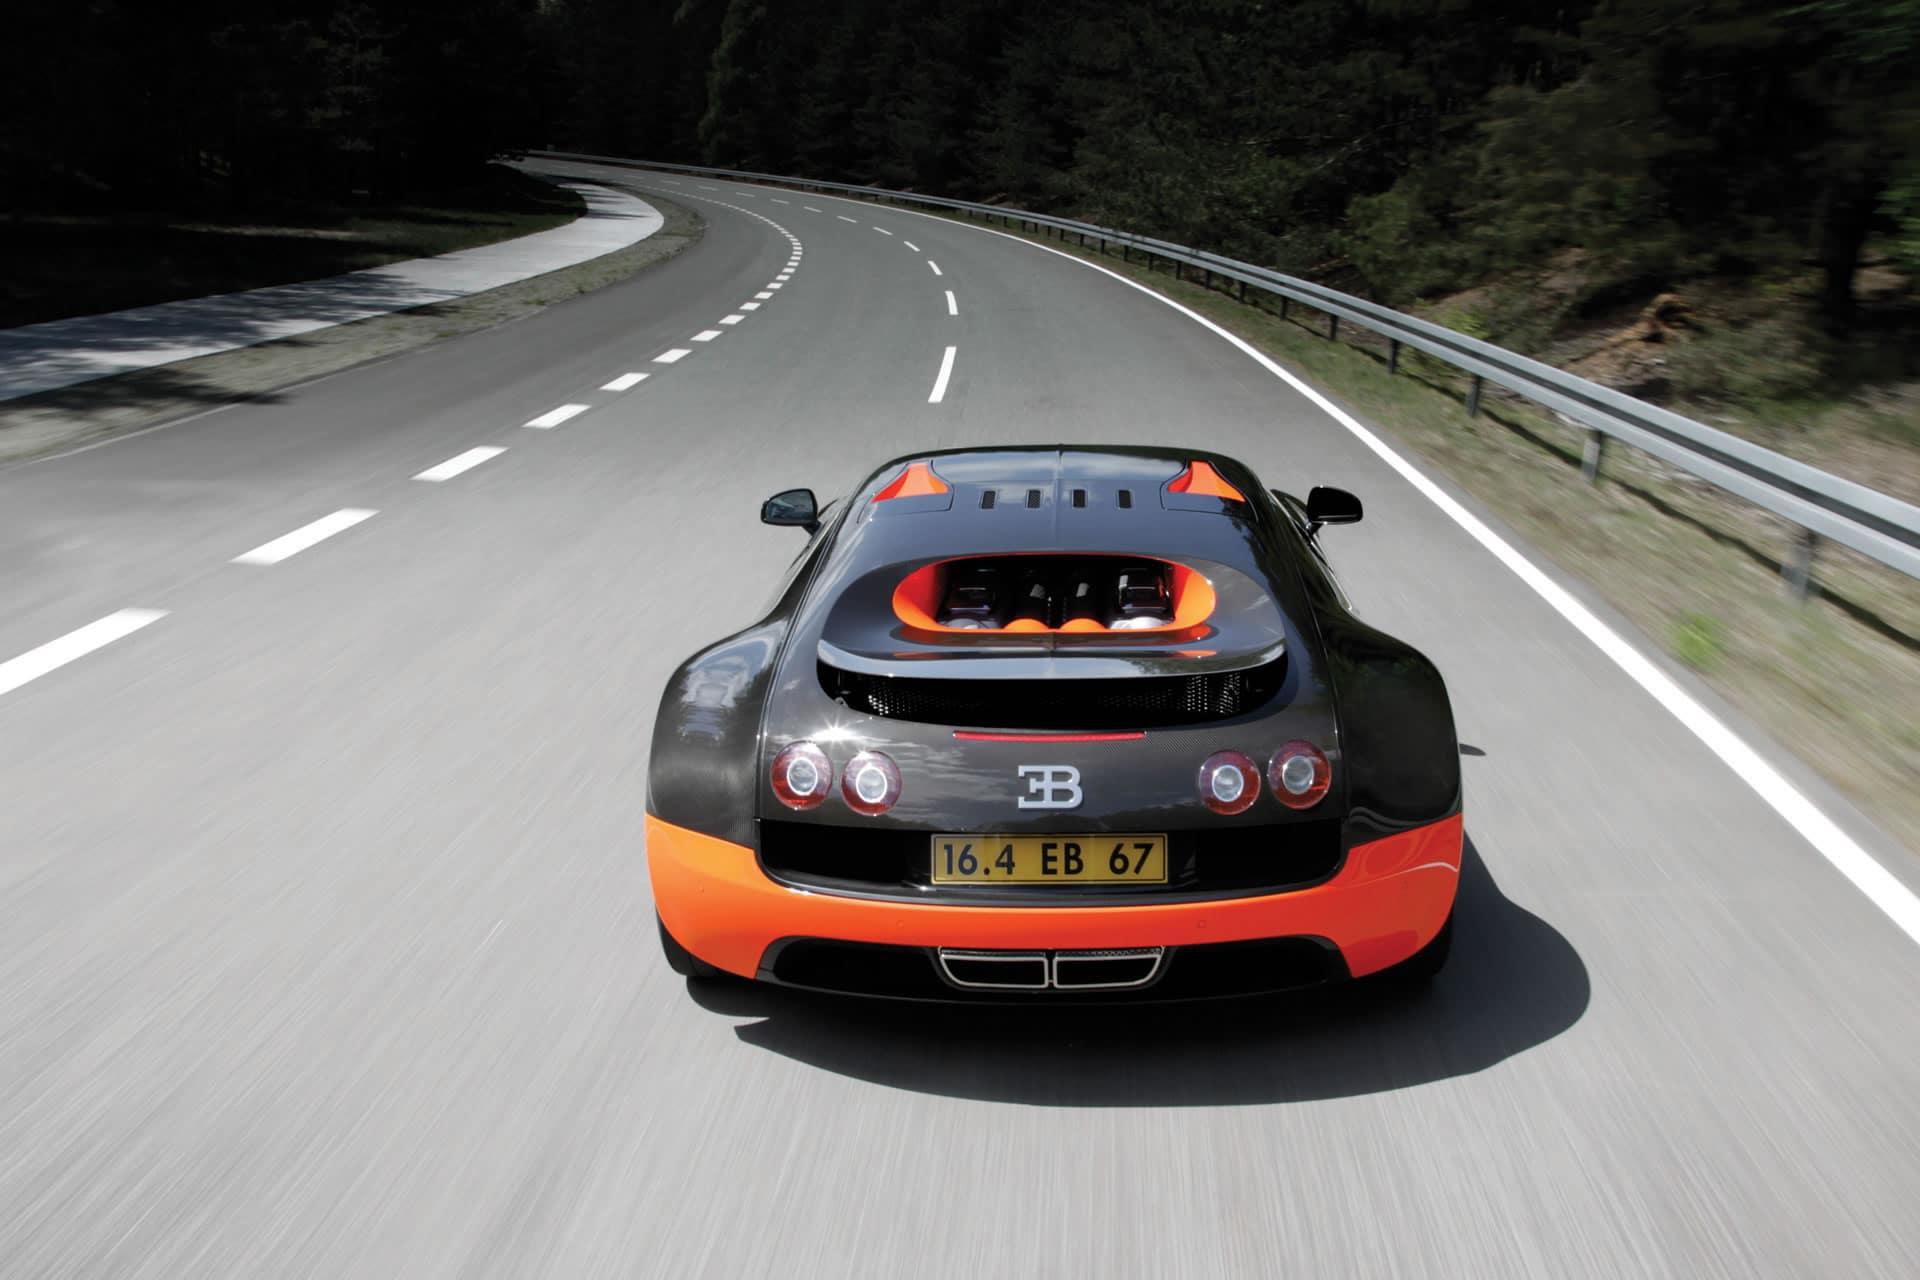 bugatti veyron 16 4 super sport weltrekord. Black Bedroom Furniture Sets. Home Design Ideas